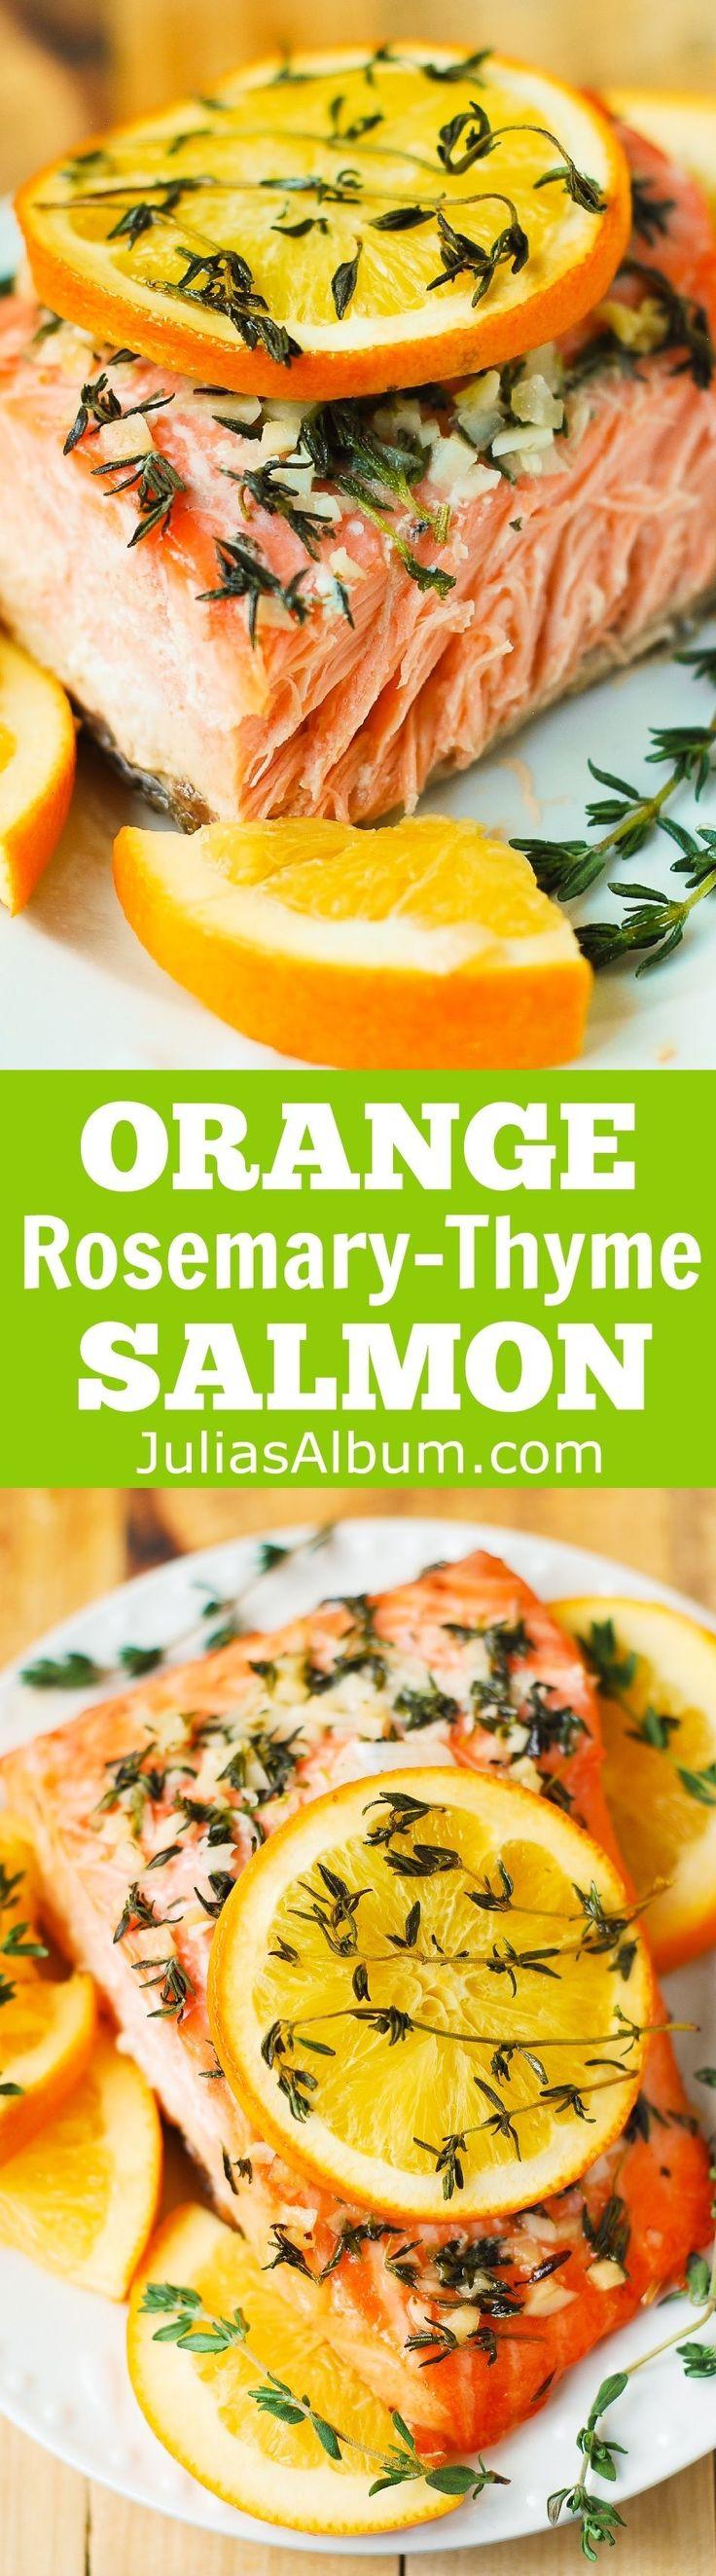 Orange Rosemary-Thyme Garlic Salmon baked in foil.